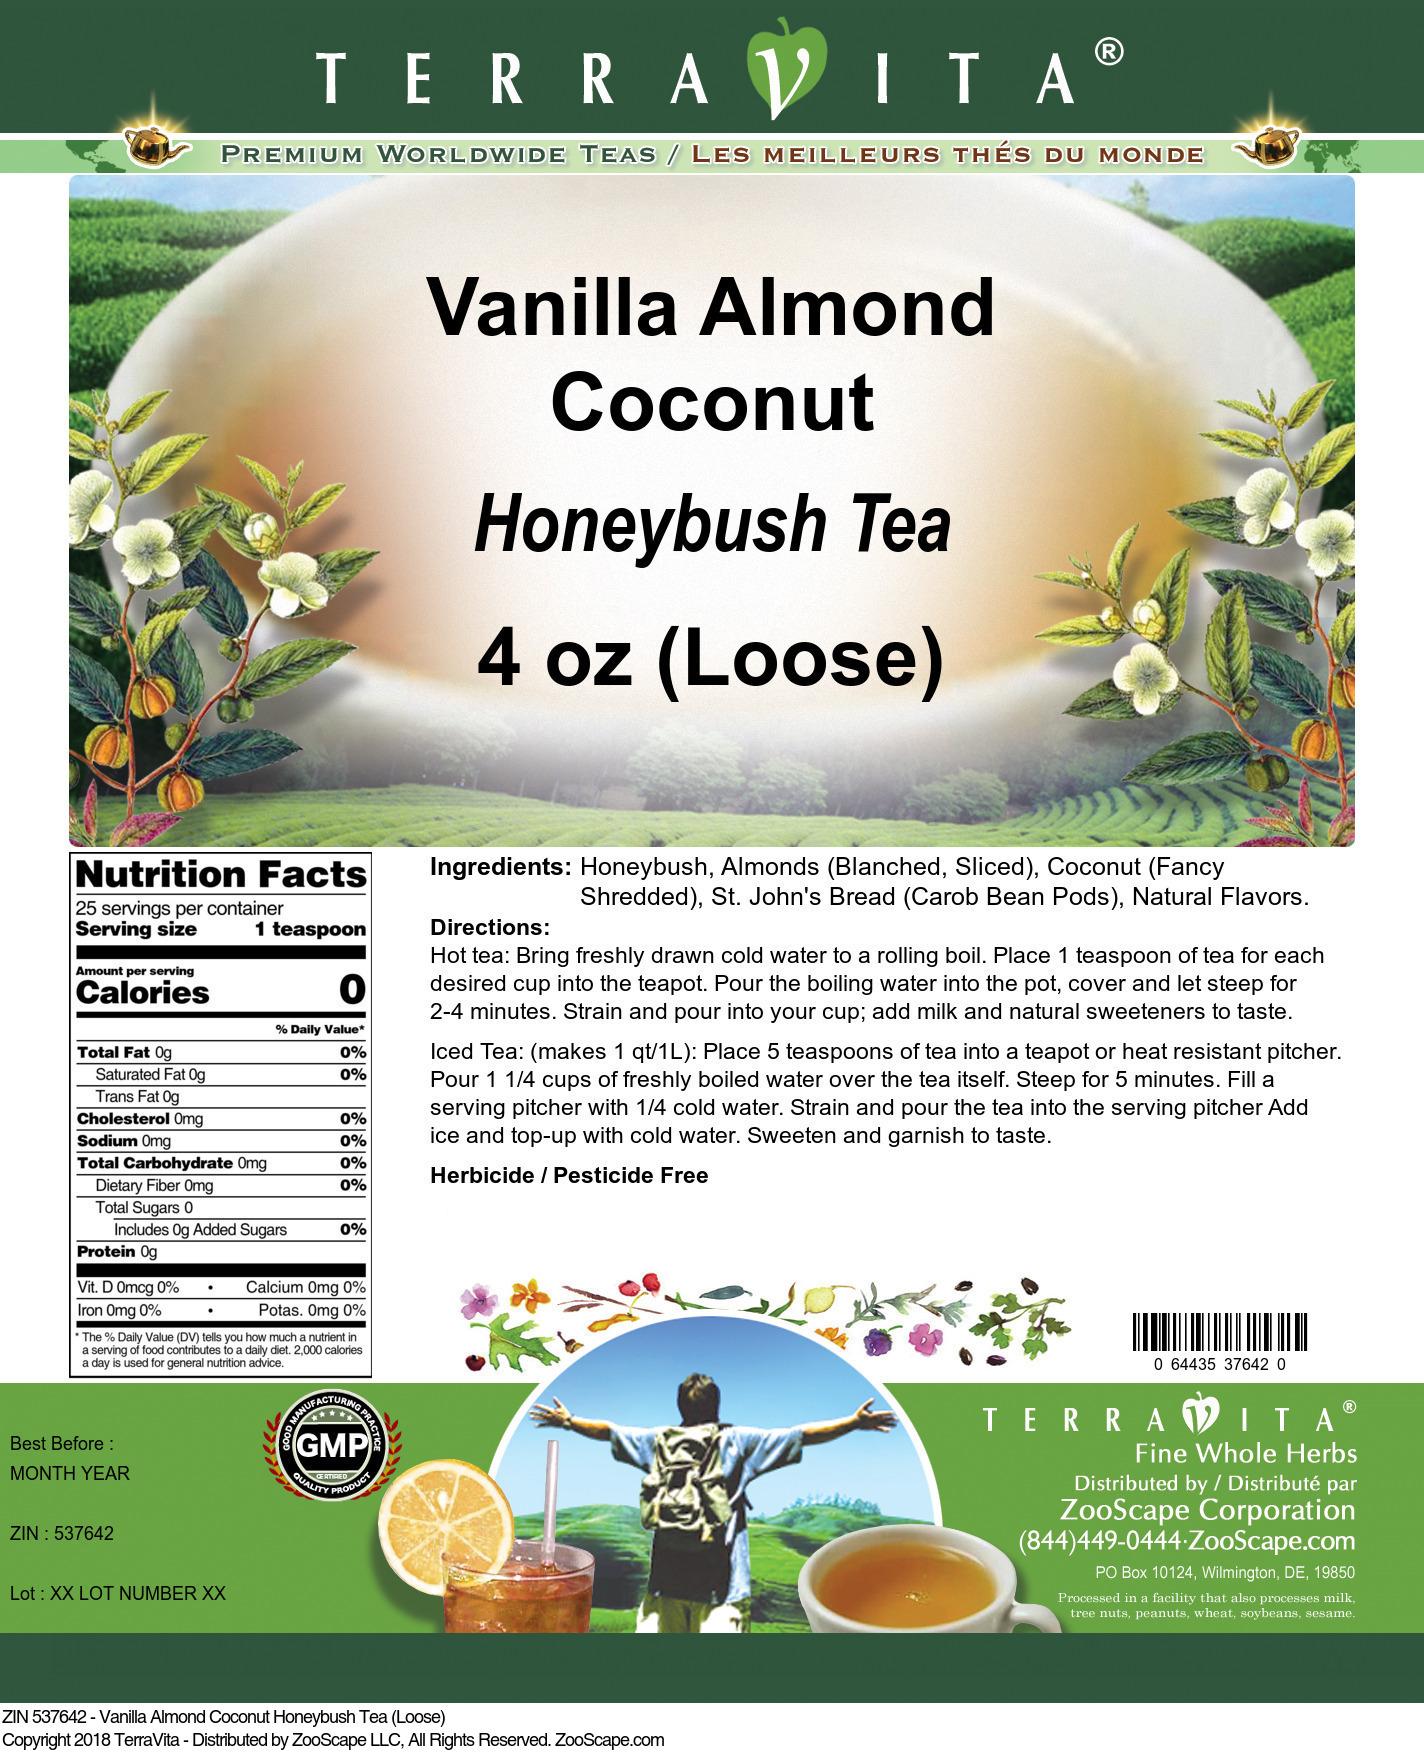 Vanilla Almond Coconut Honeybush Tea (Loose)